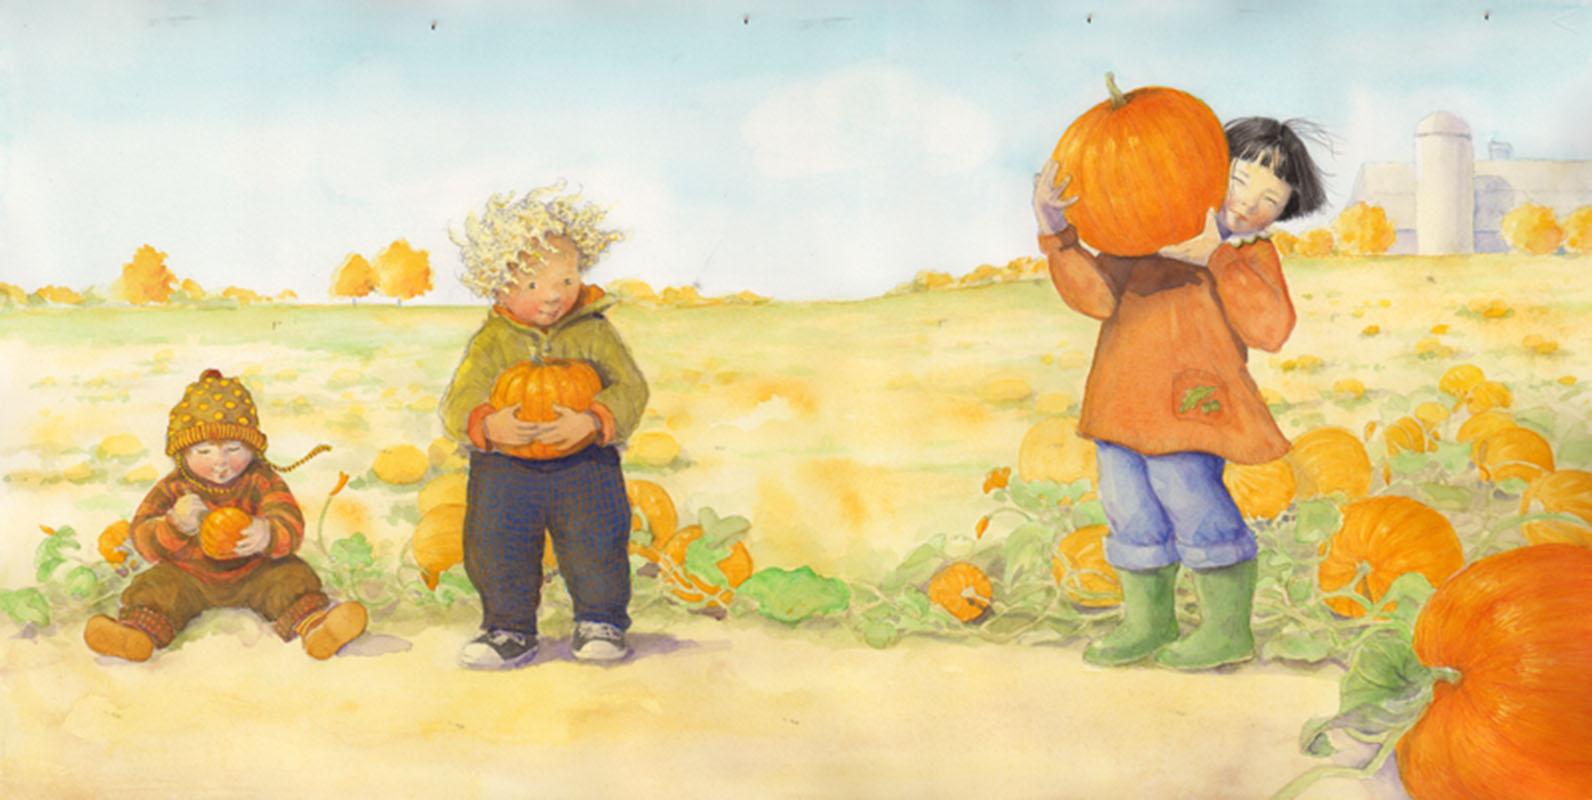 The Pumpkin Knows